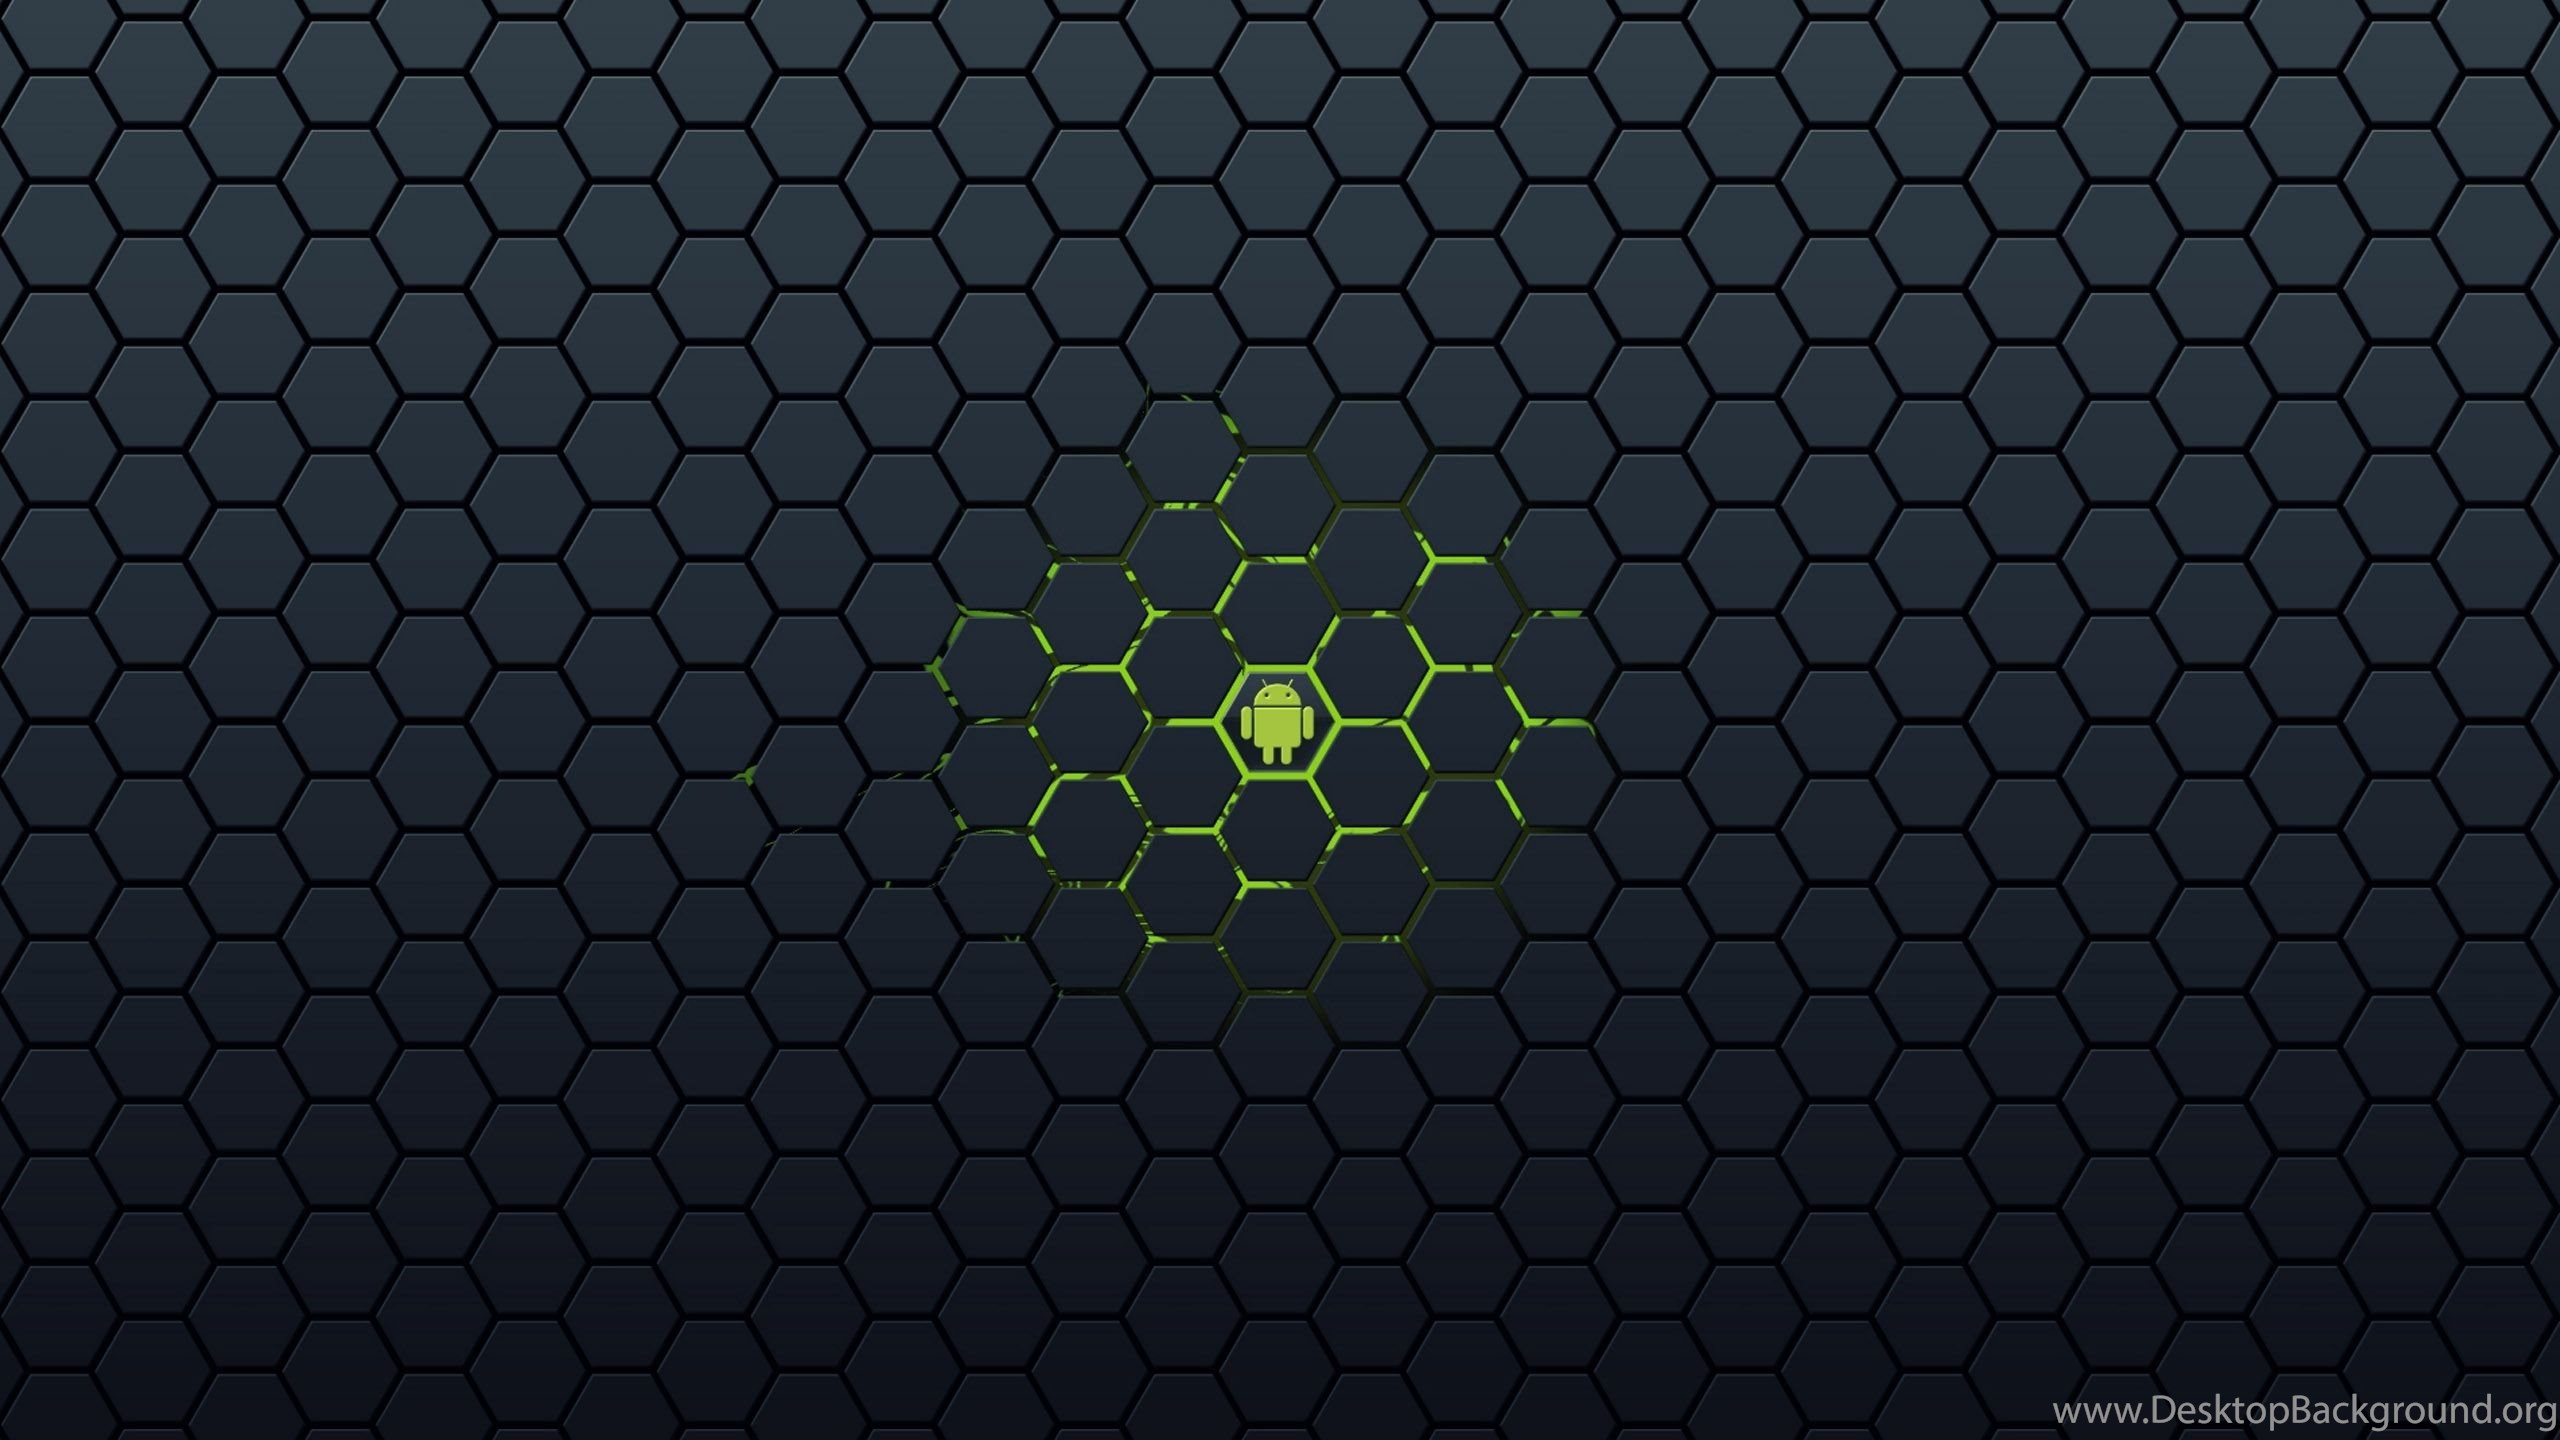 Linux Wallpapers Desktop Background